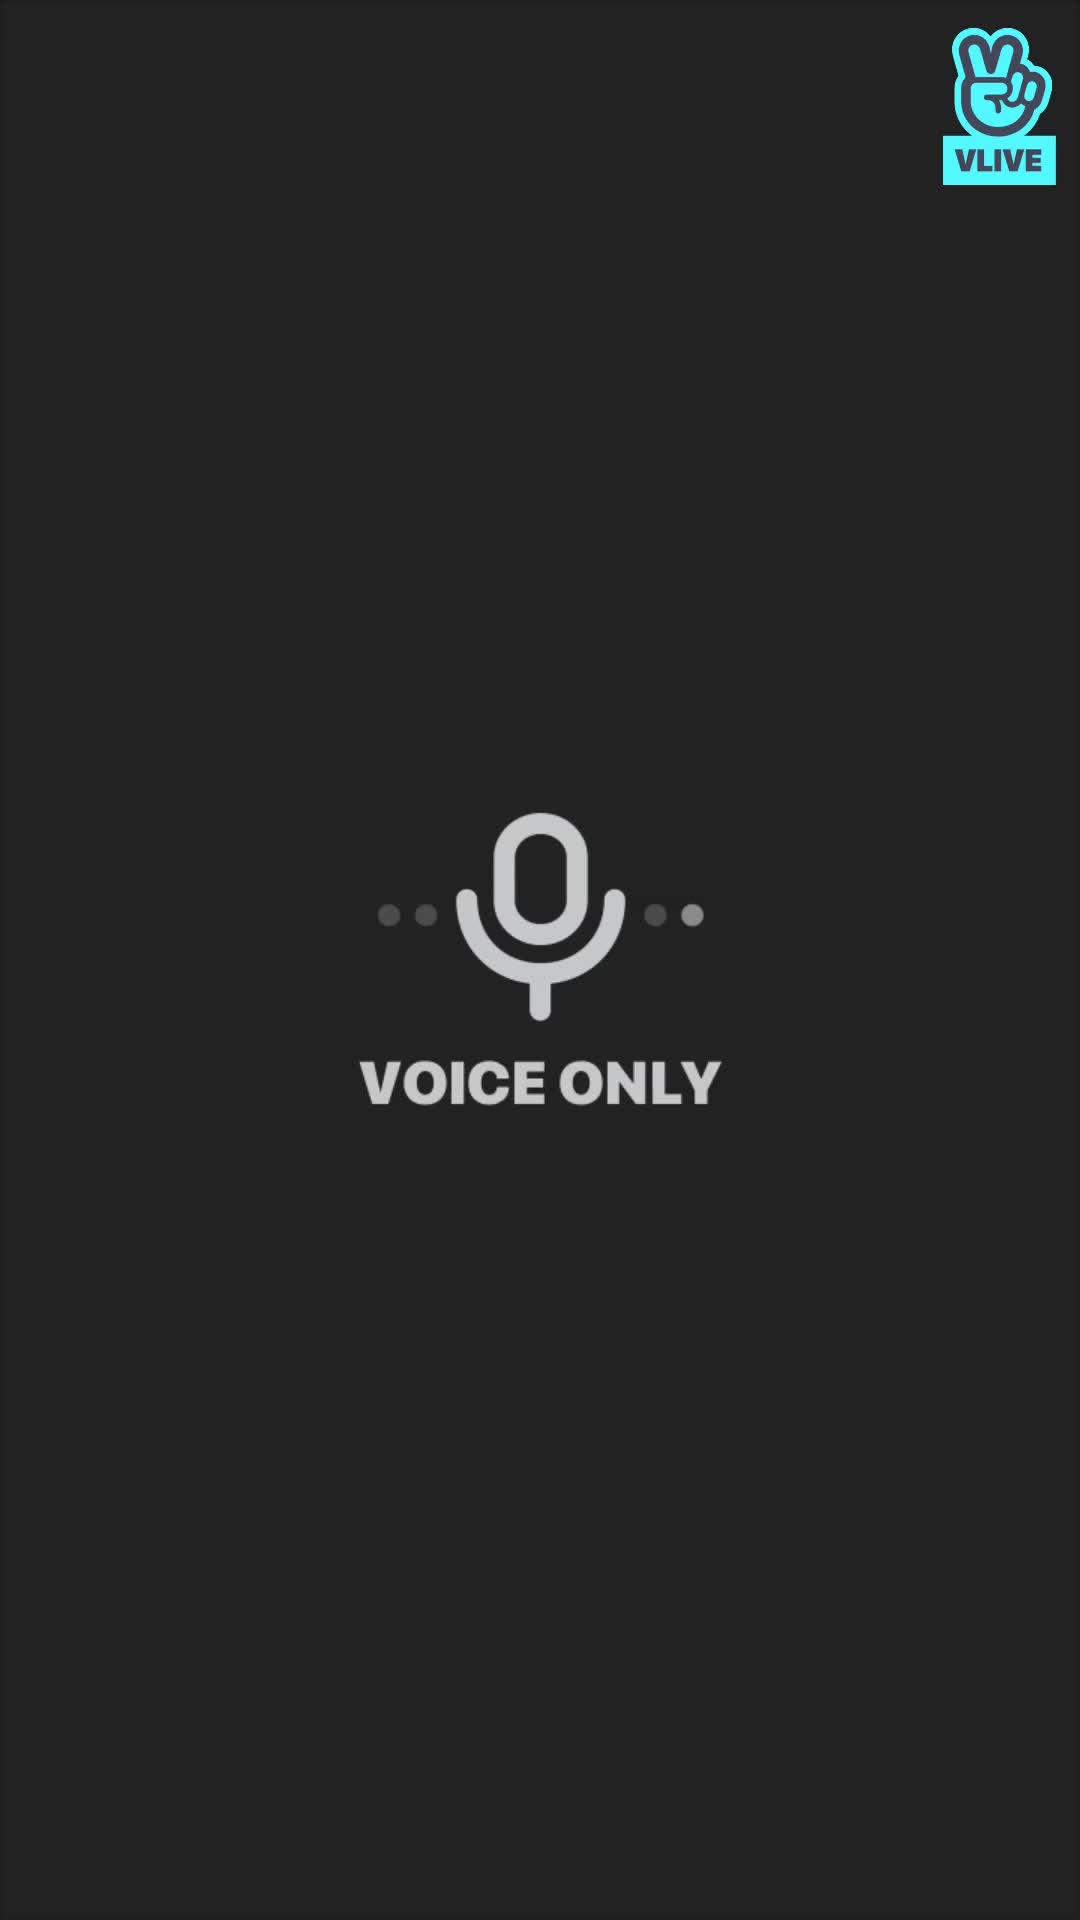 [RADIO] 캐럿들 귀대귀대 #77 도겸의 심야책빵